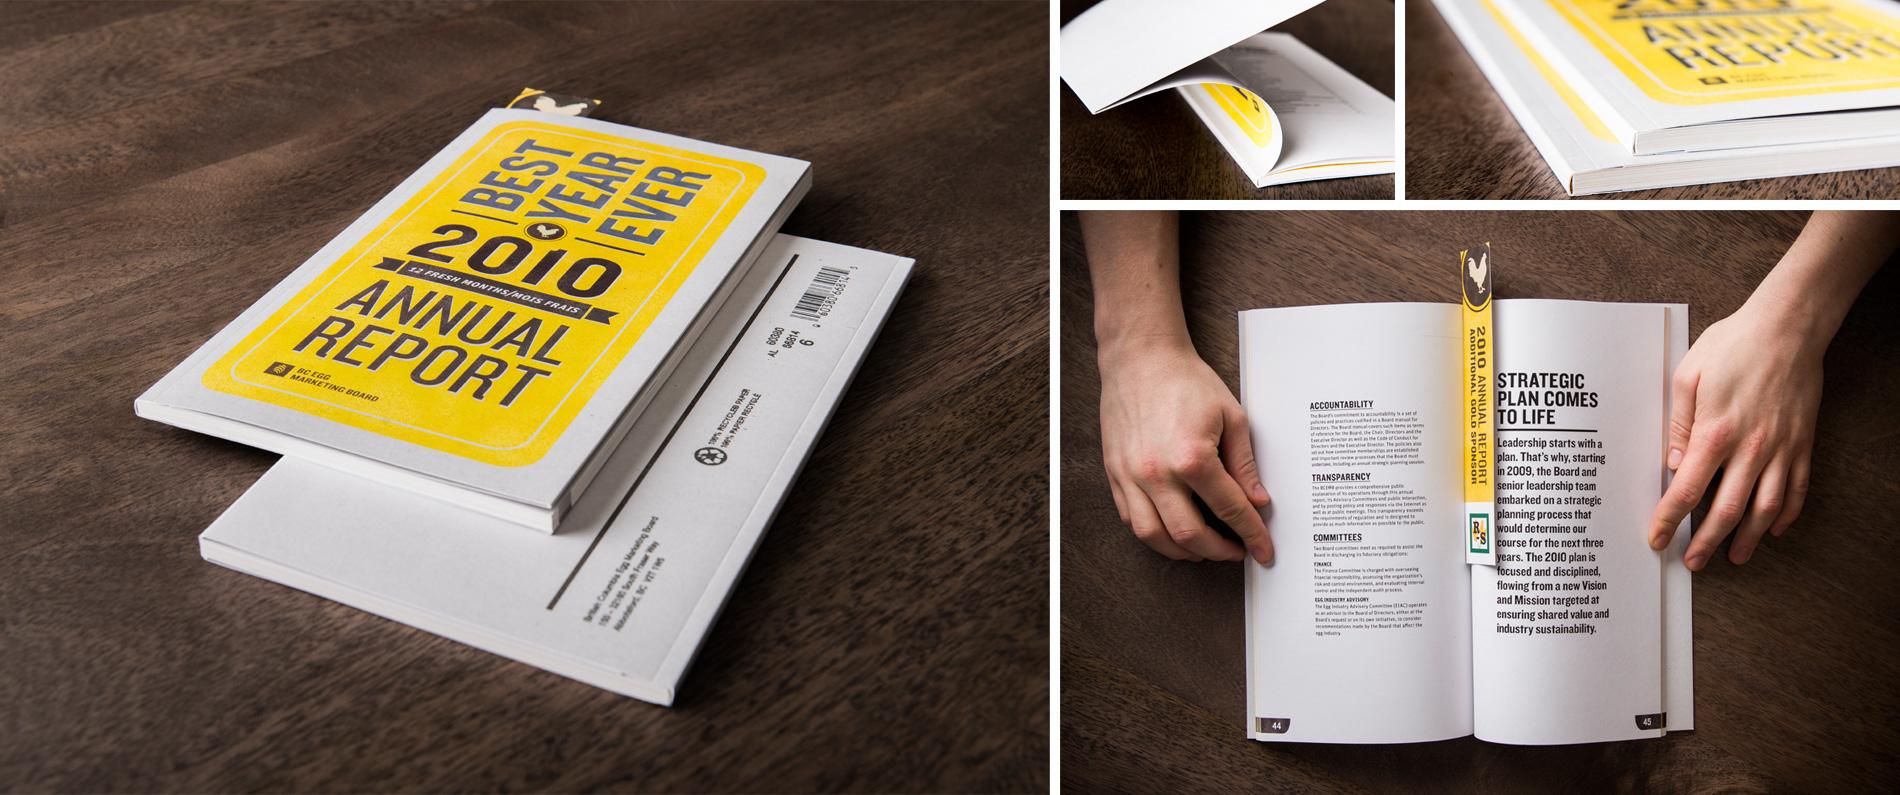 Custom printed book for BC Egg Foundation